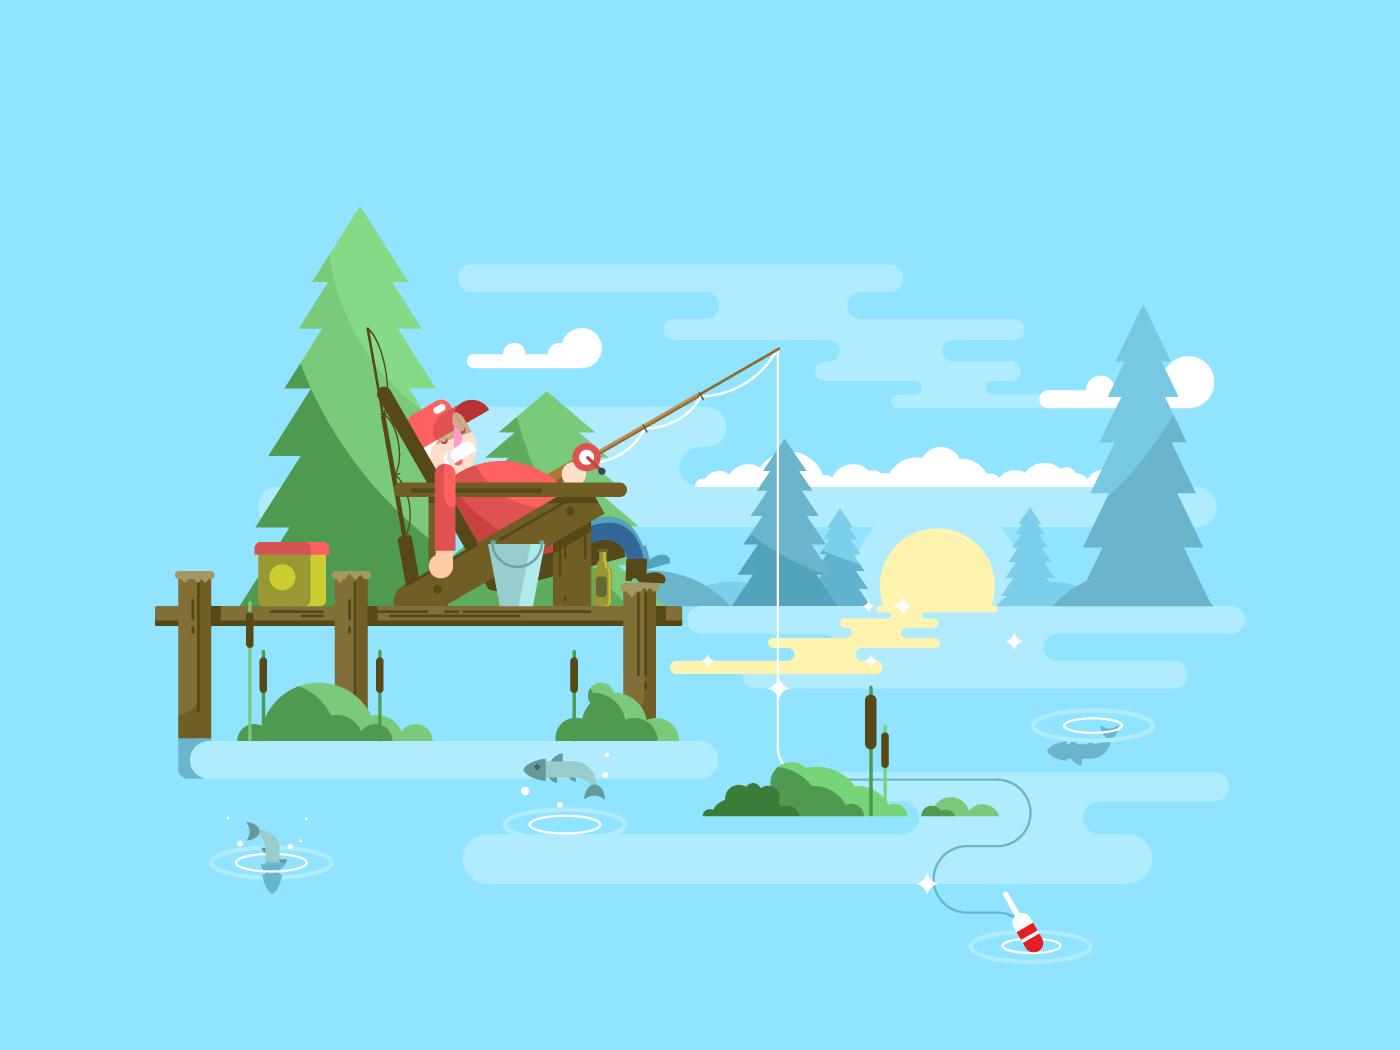 Rest fishing flat vector illustration